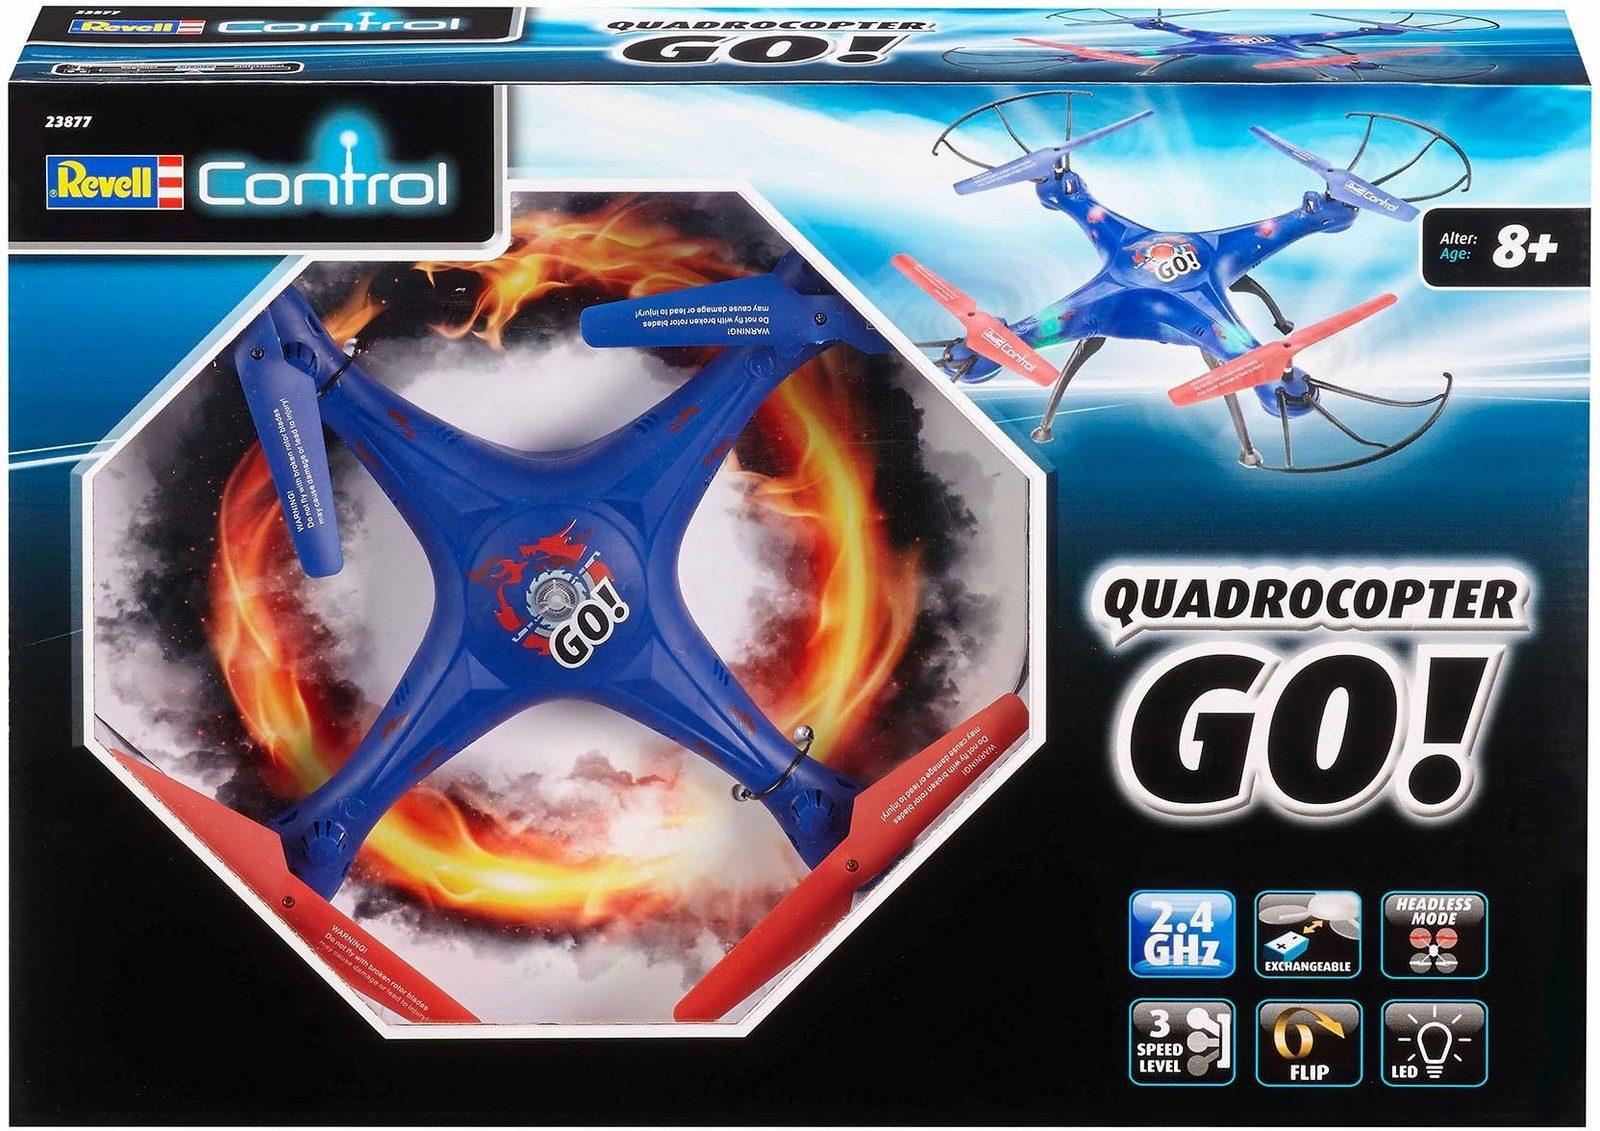 Revell RC Quadrocopter, »Revell control, GO!, 2,4 GHz« jetztbilligerkaufen